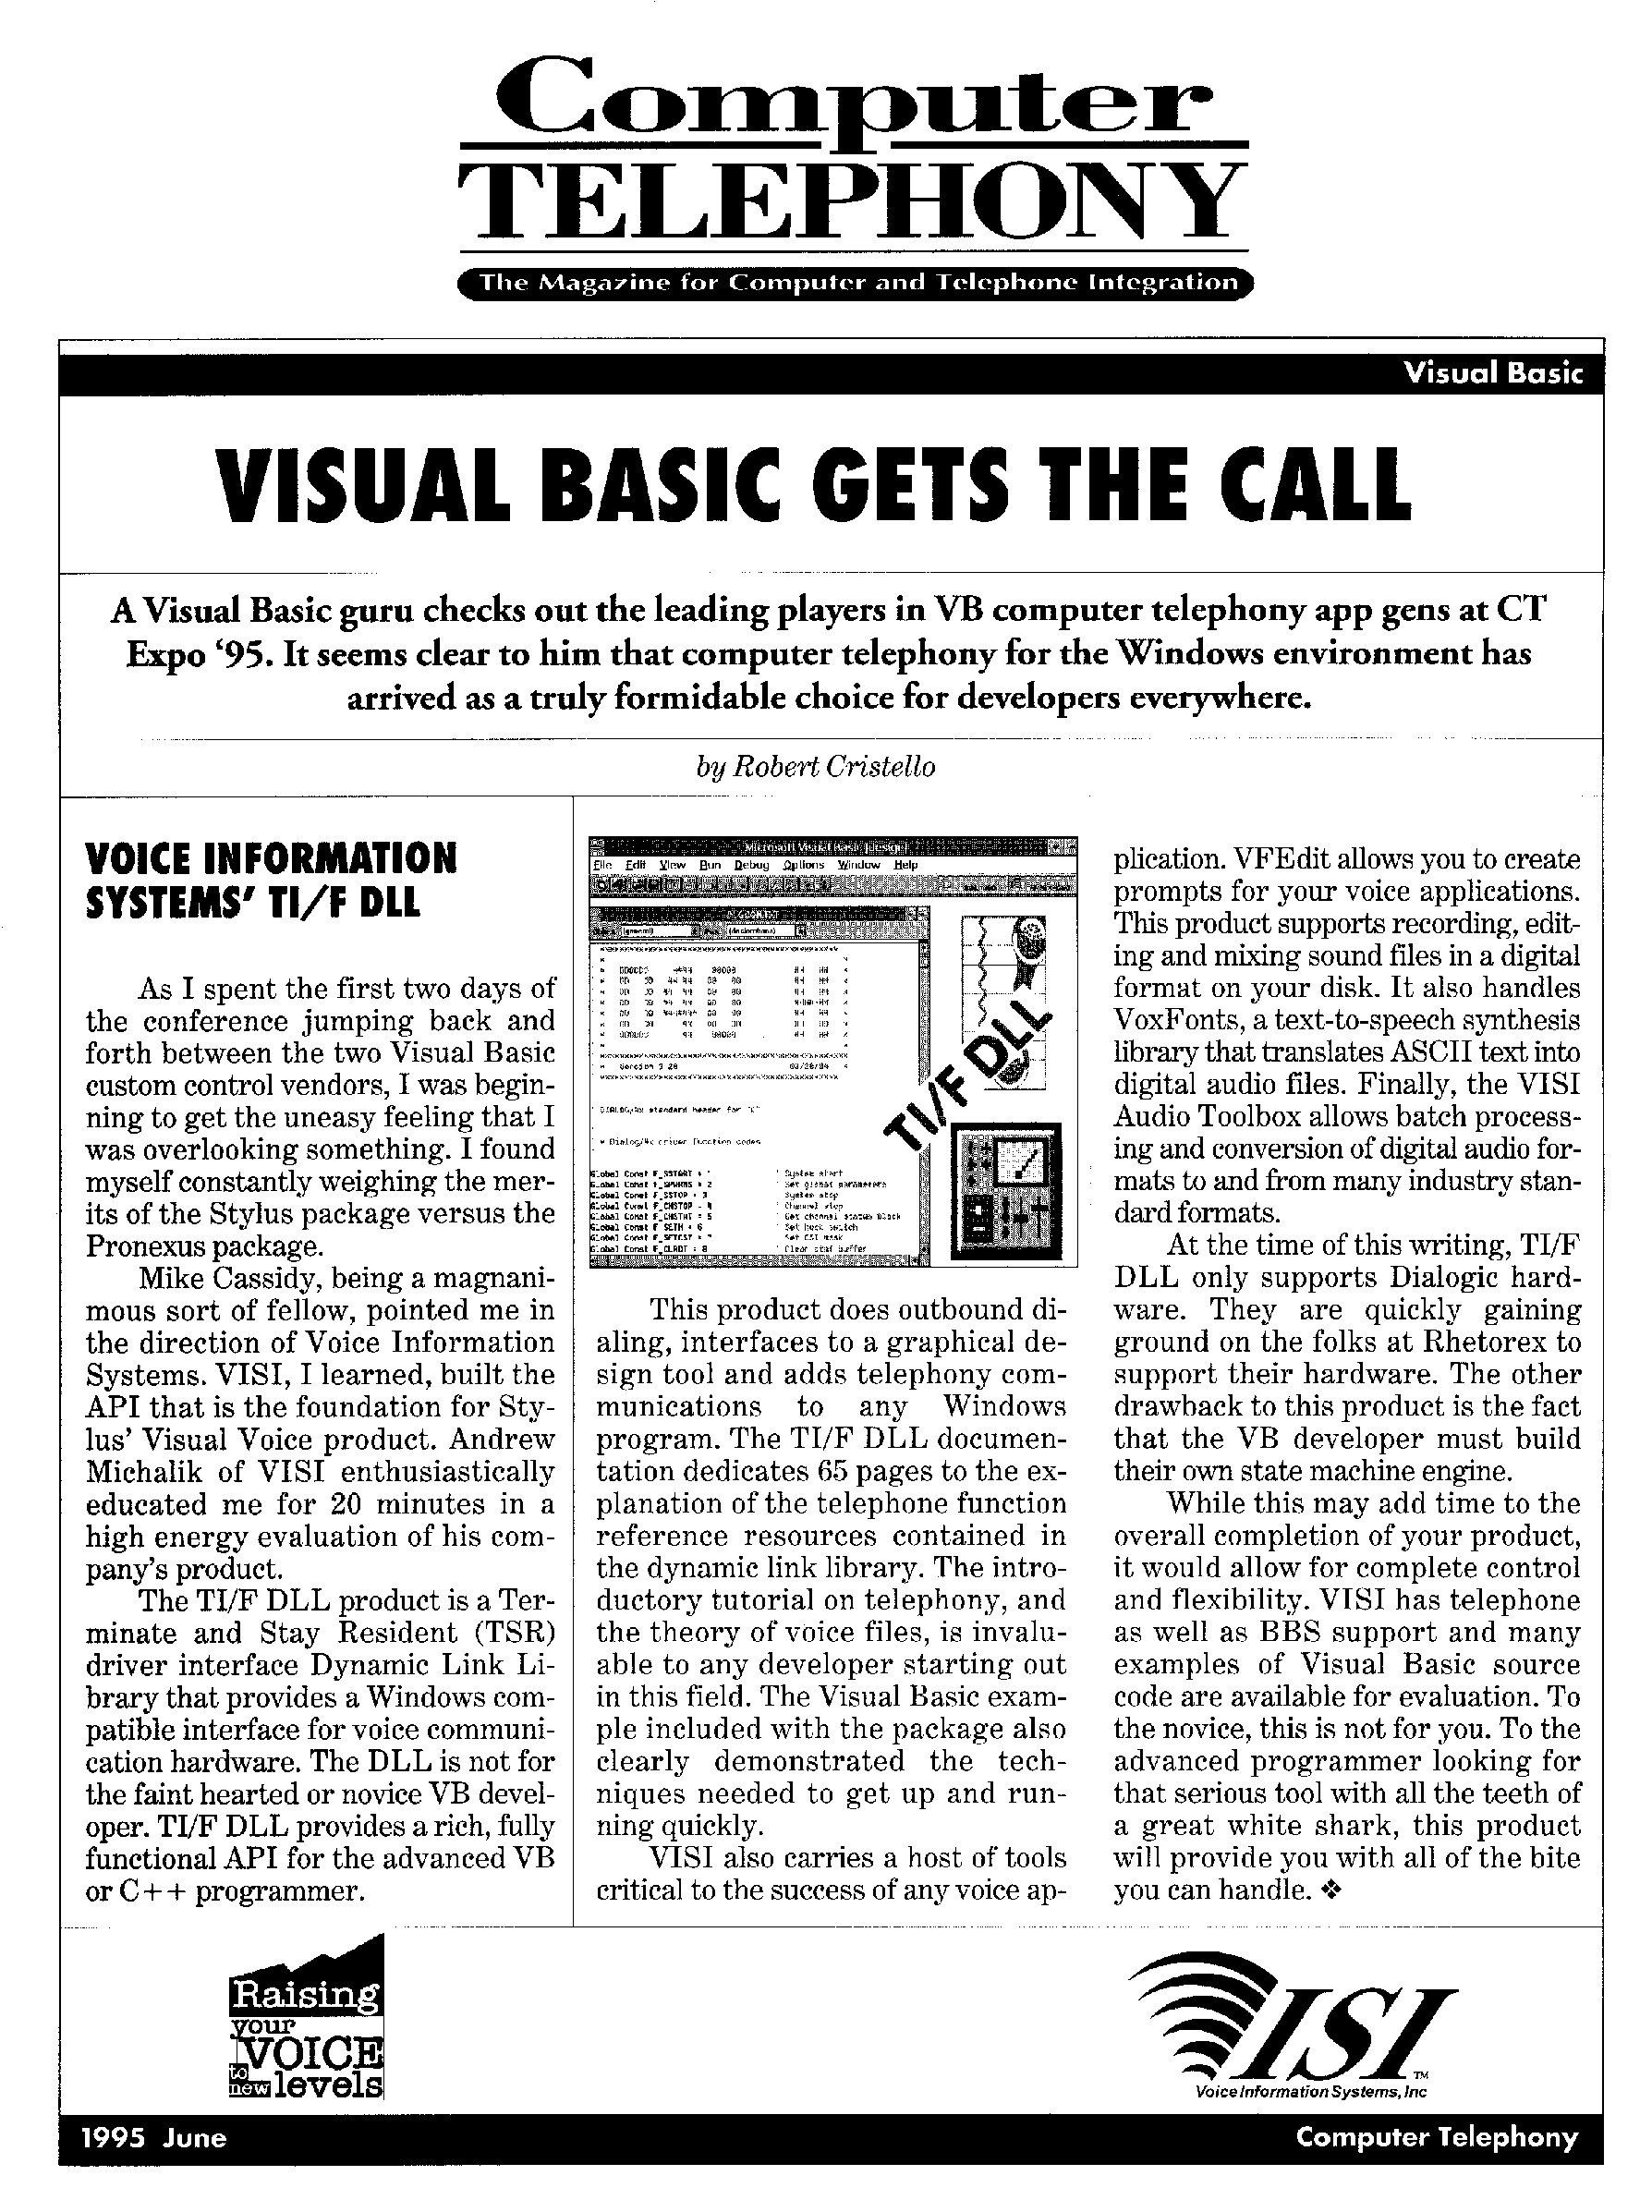 Teleconnect Editor's Choice